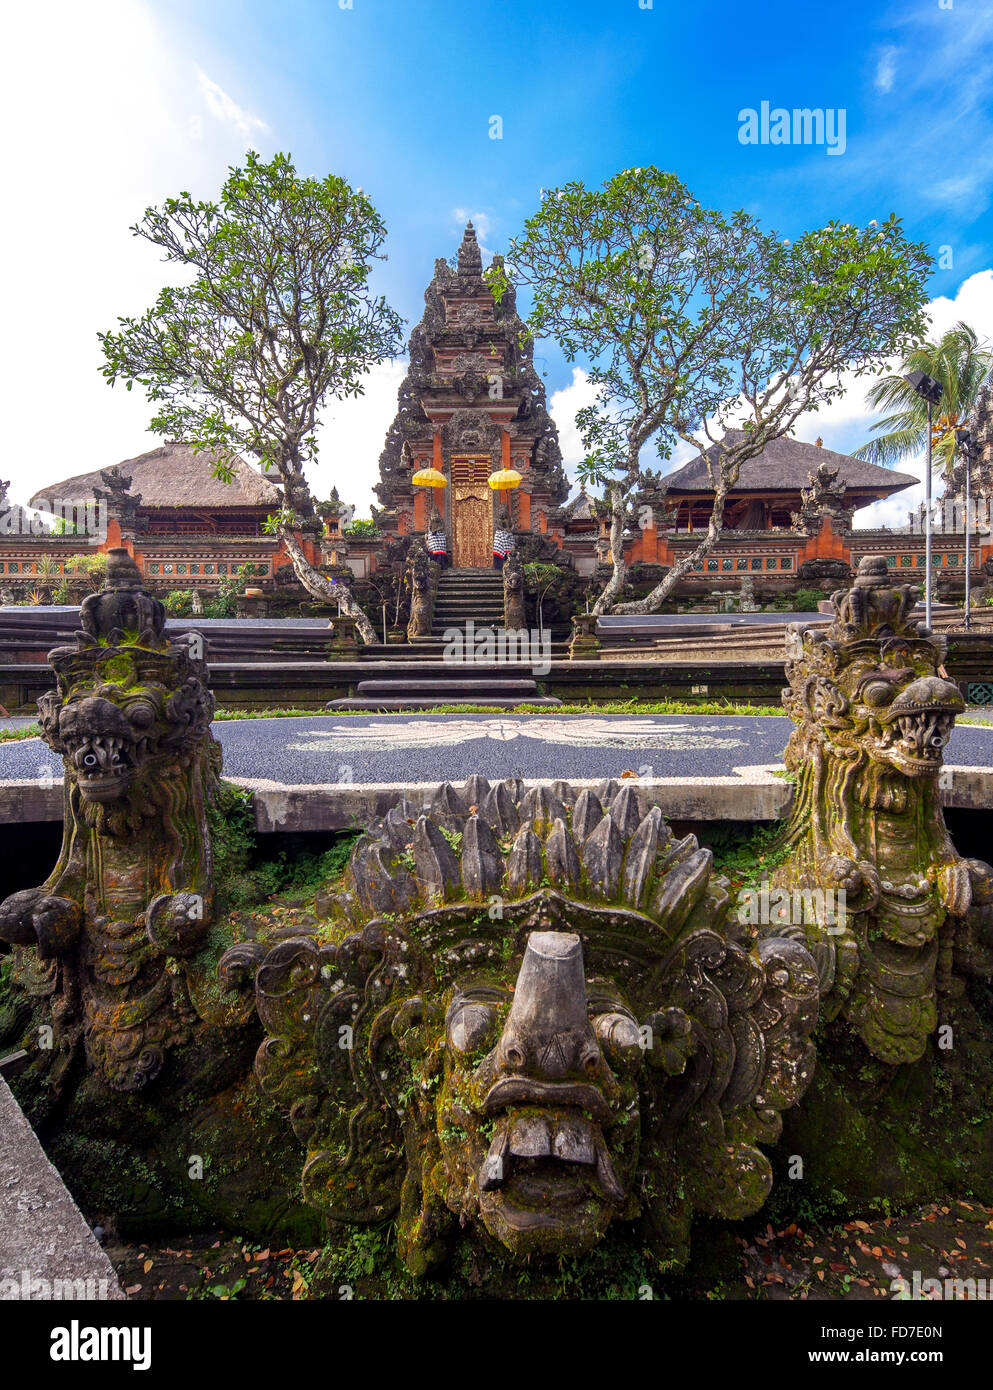 Temple Pura Taman Saraswati, Ubud, Bali, Indonesia, Asia - Stock Image